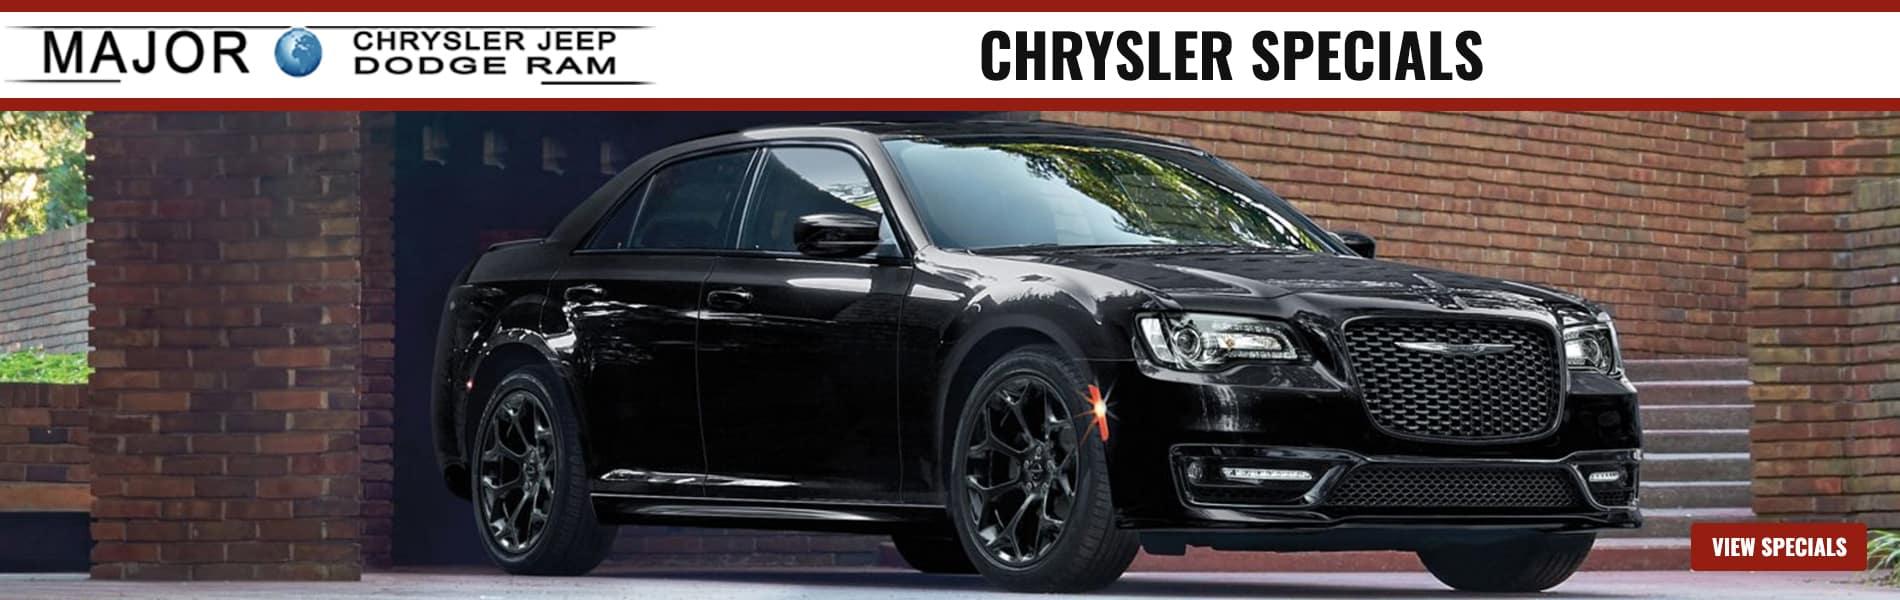 New Used Car Dealer Major World Chrysler Jeep Dodge RAM Long - Chrysler specials